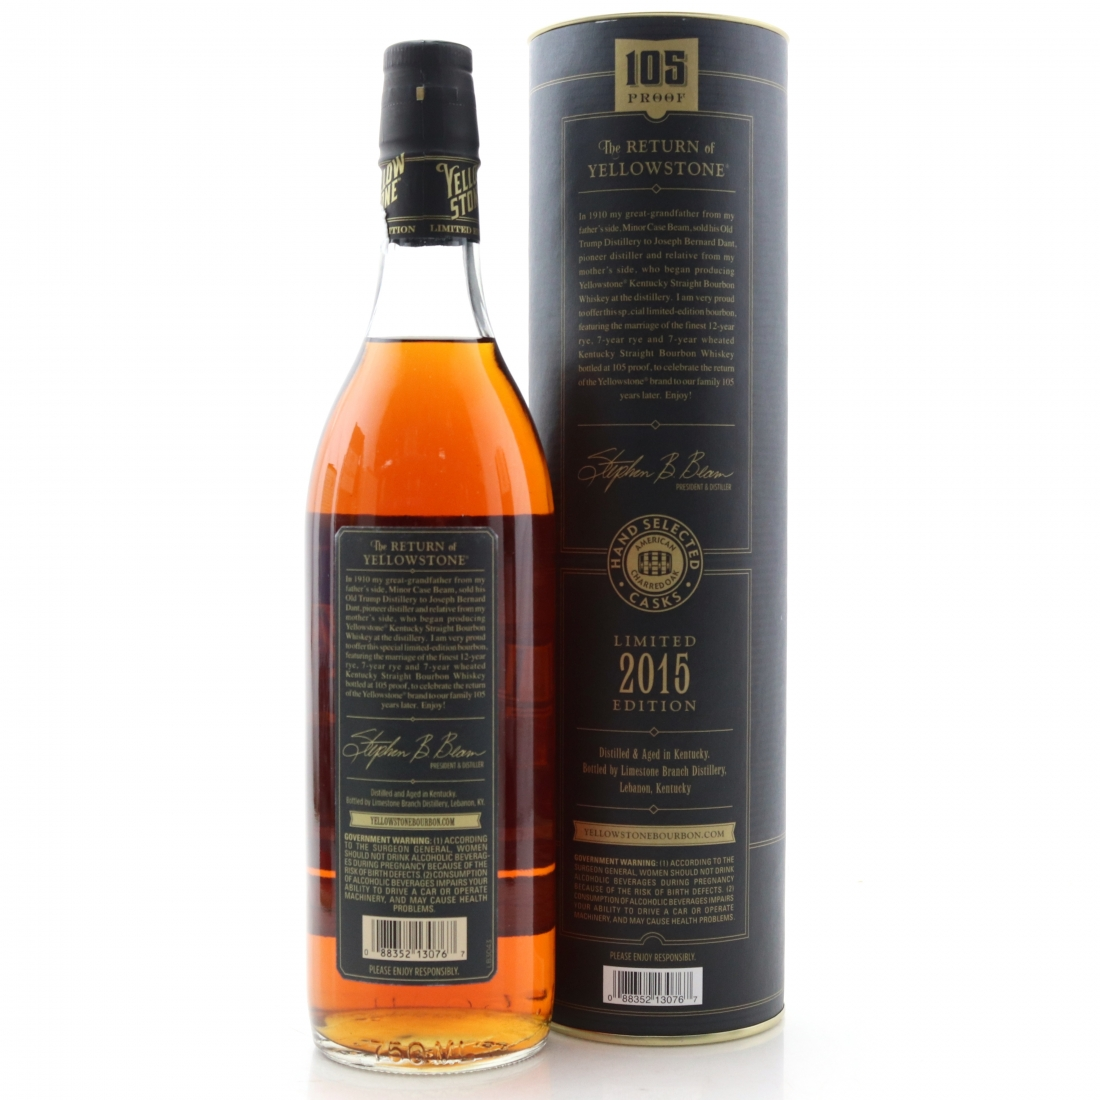 Yellowstone 7 Year Old Kentucky Straight Bourbon 101 Proof / 2015 Edition